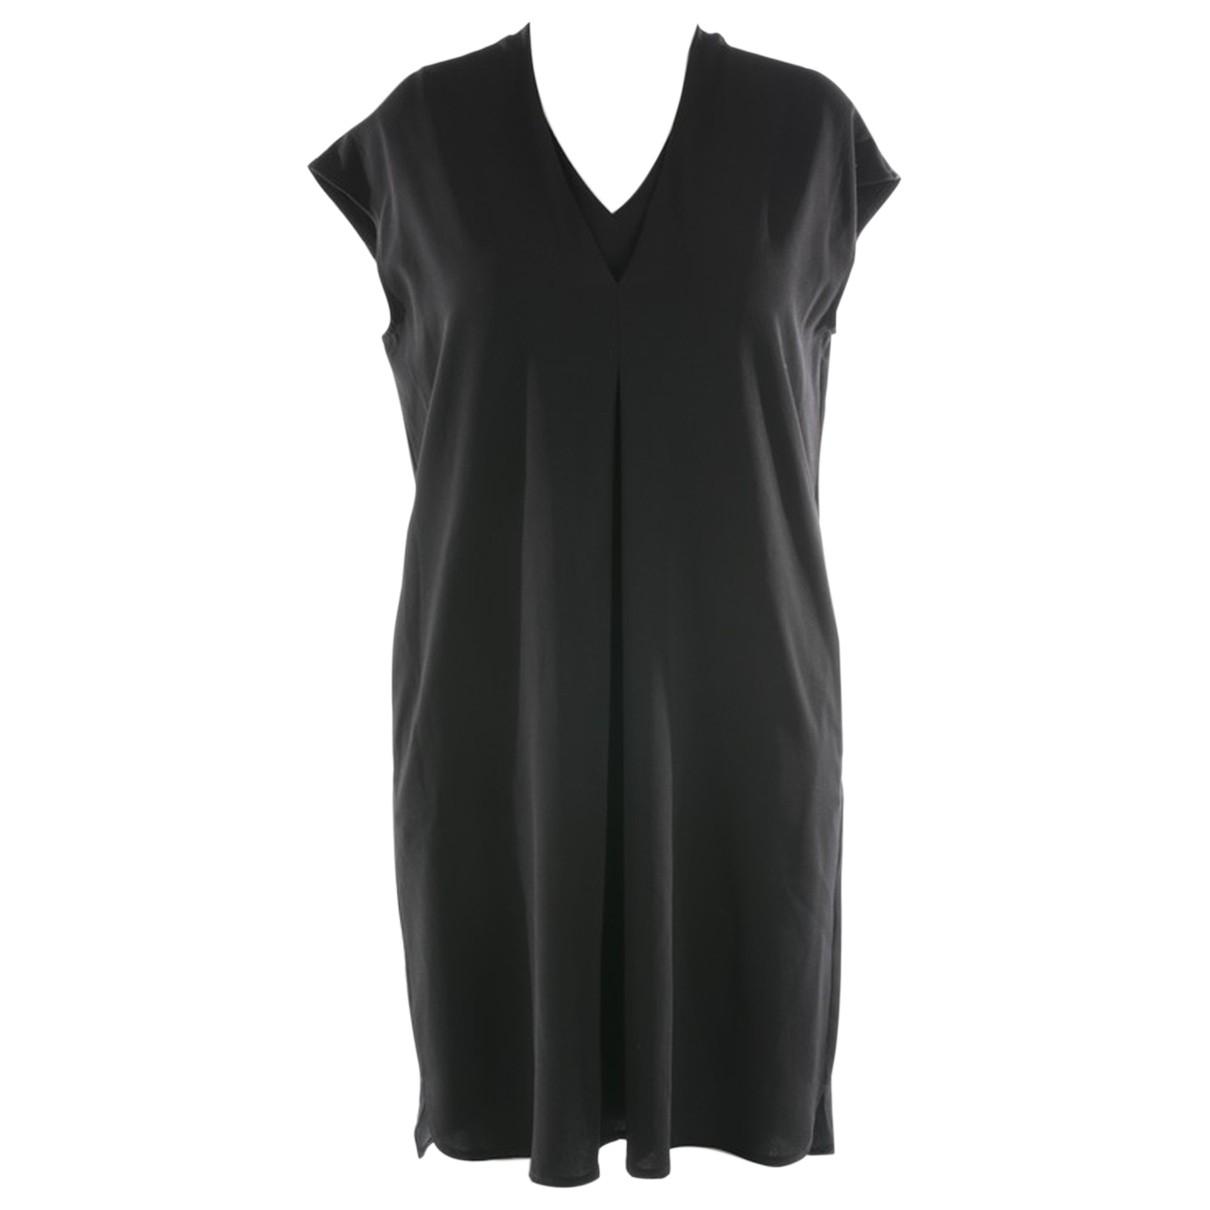 Joseph Ribkoff - Robe   pour femme en lin - noir